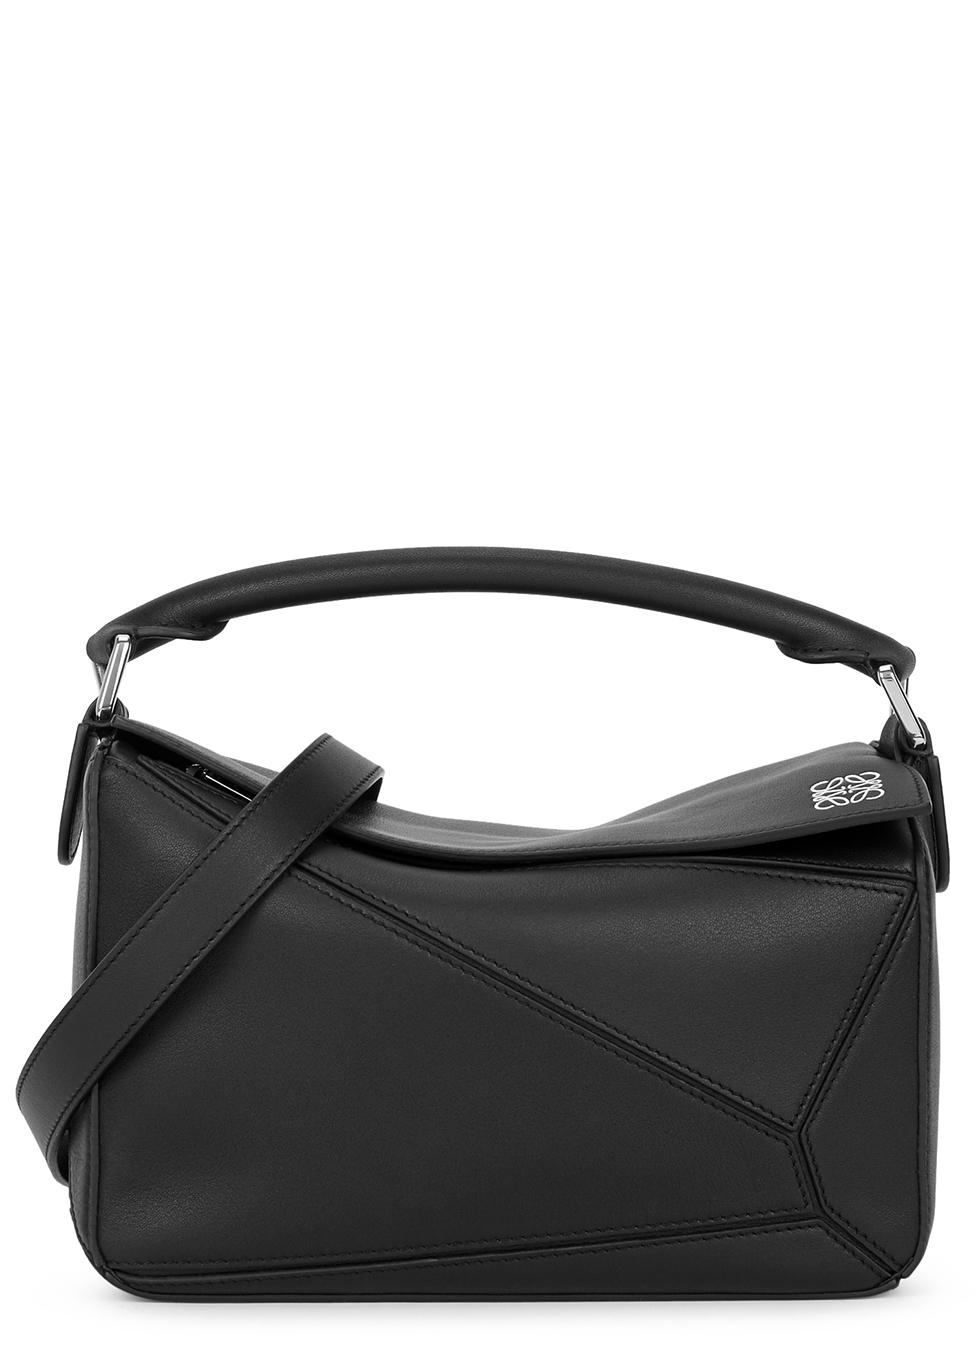 Nichols Purses Designer BagsHandbags Women's And Harvey 4Rjc5Lq3A